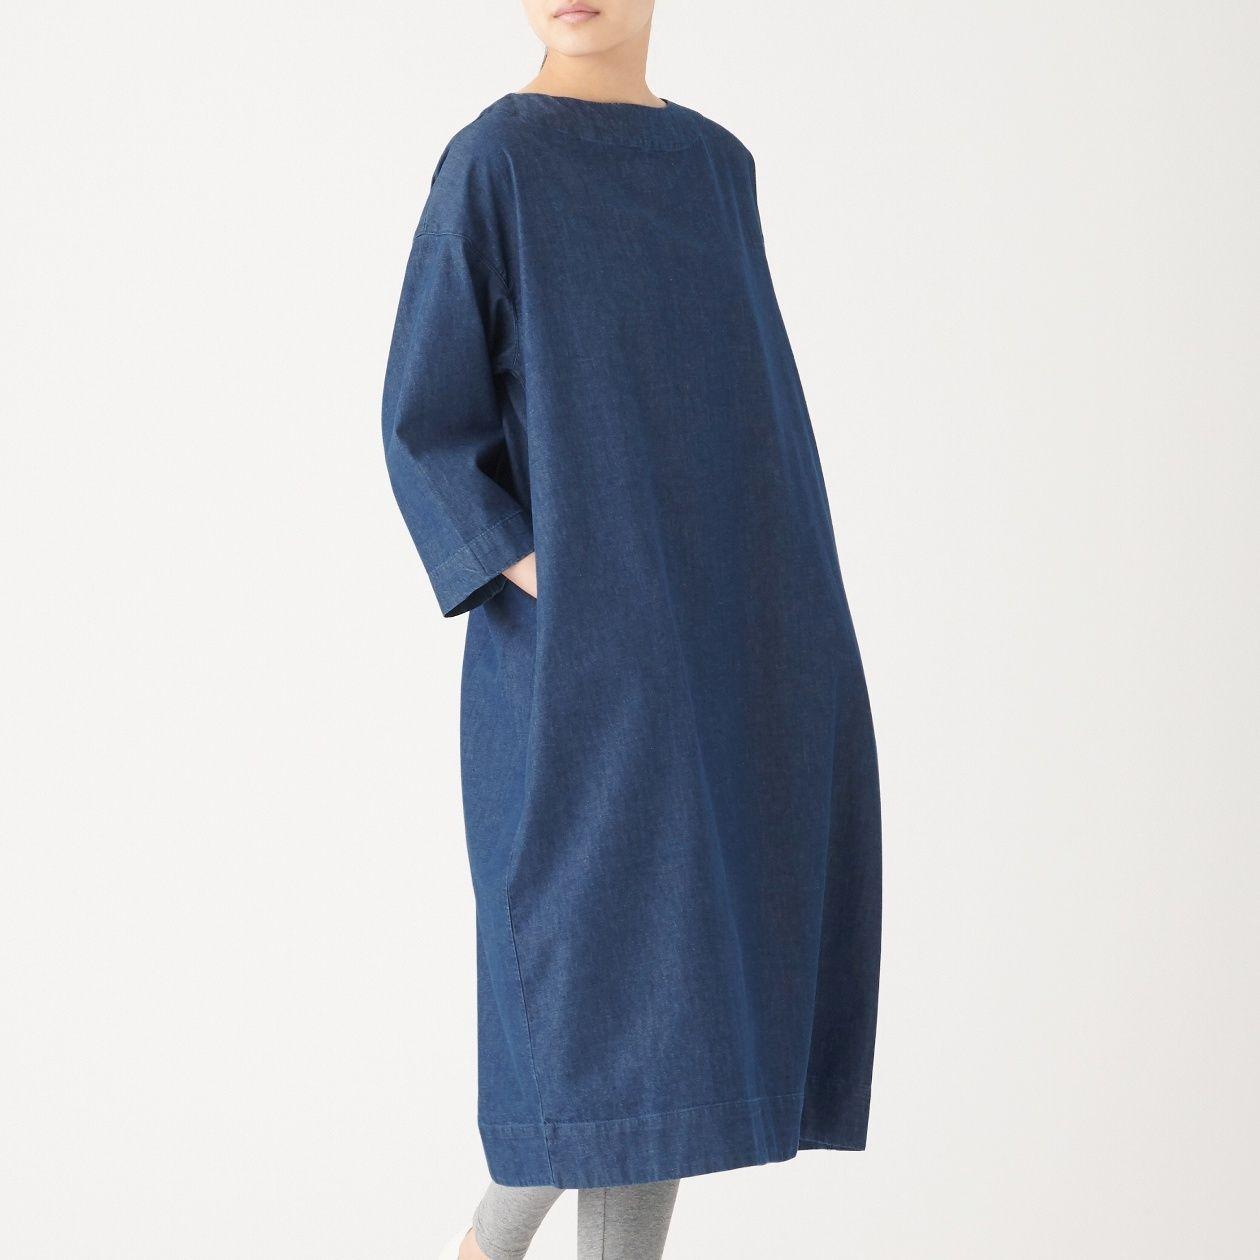 INDIAN COTTON DENIM PULLOVER DRESS